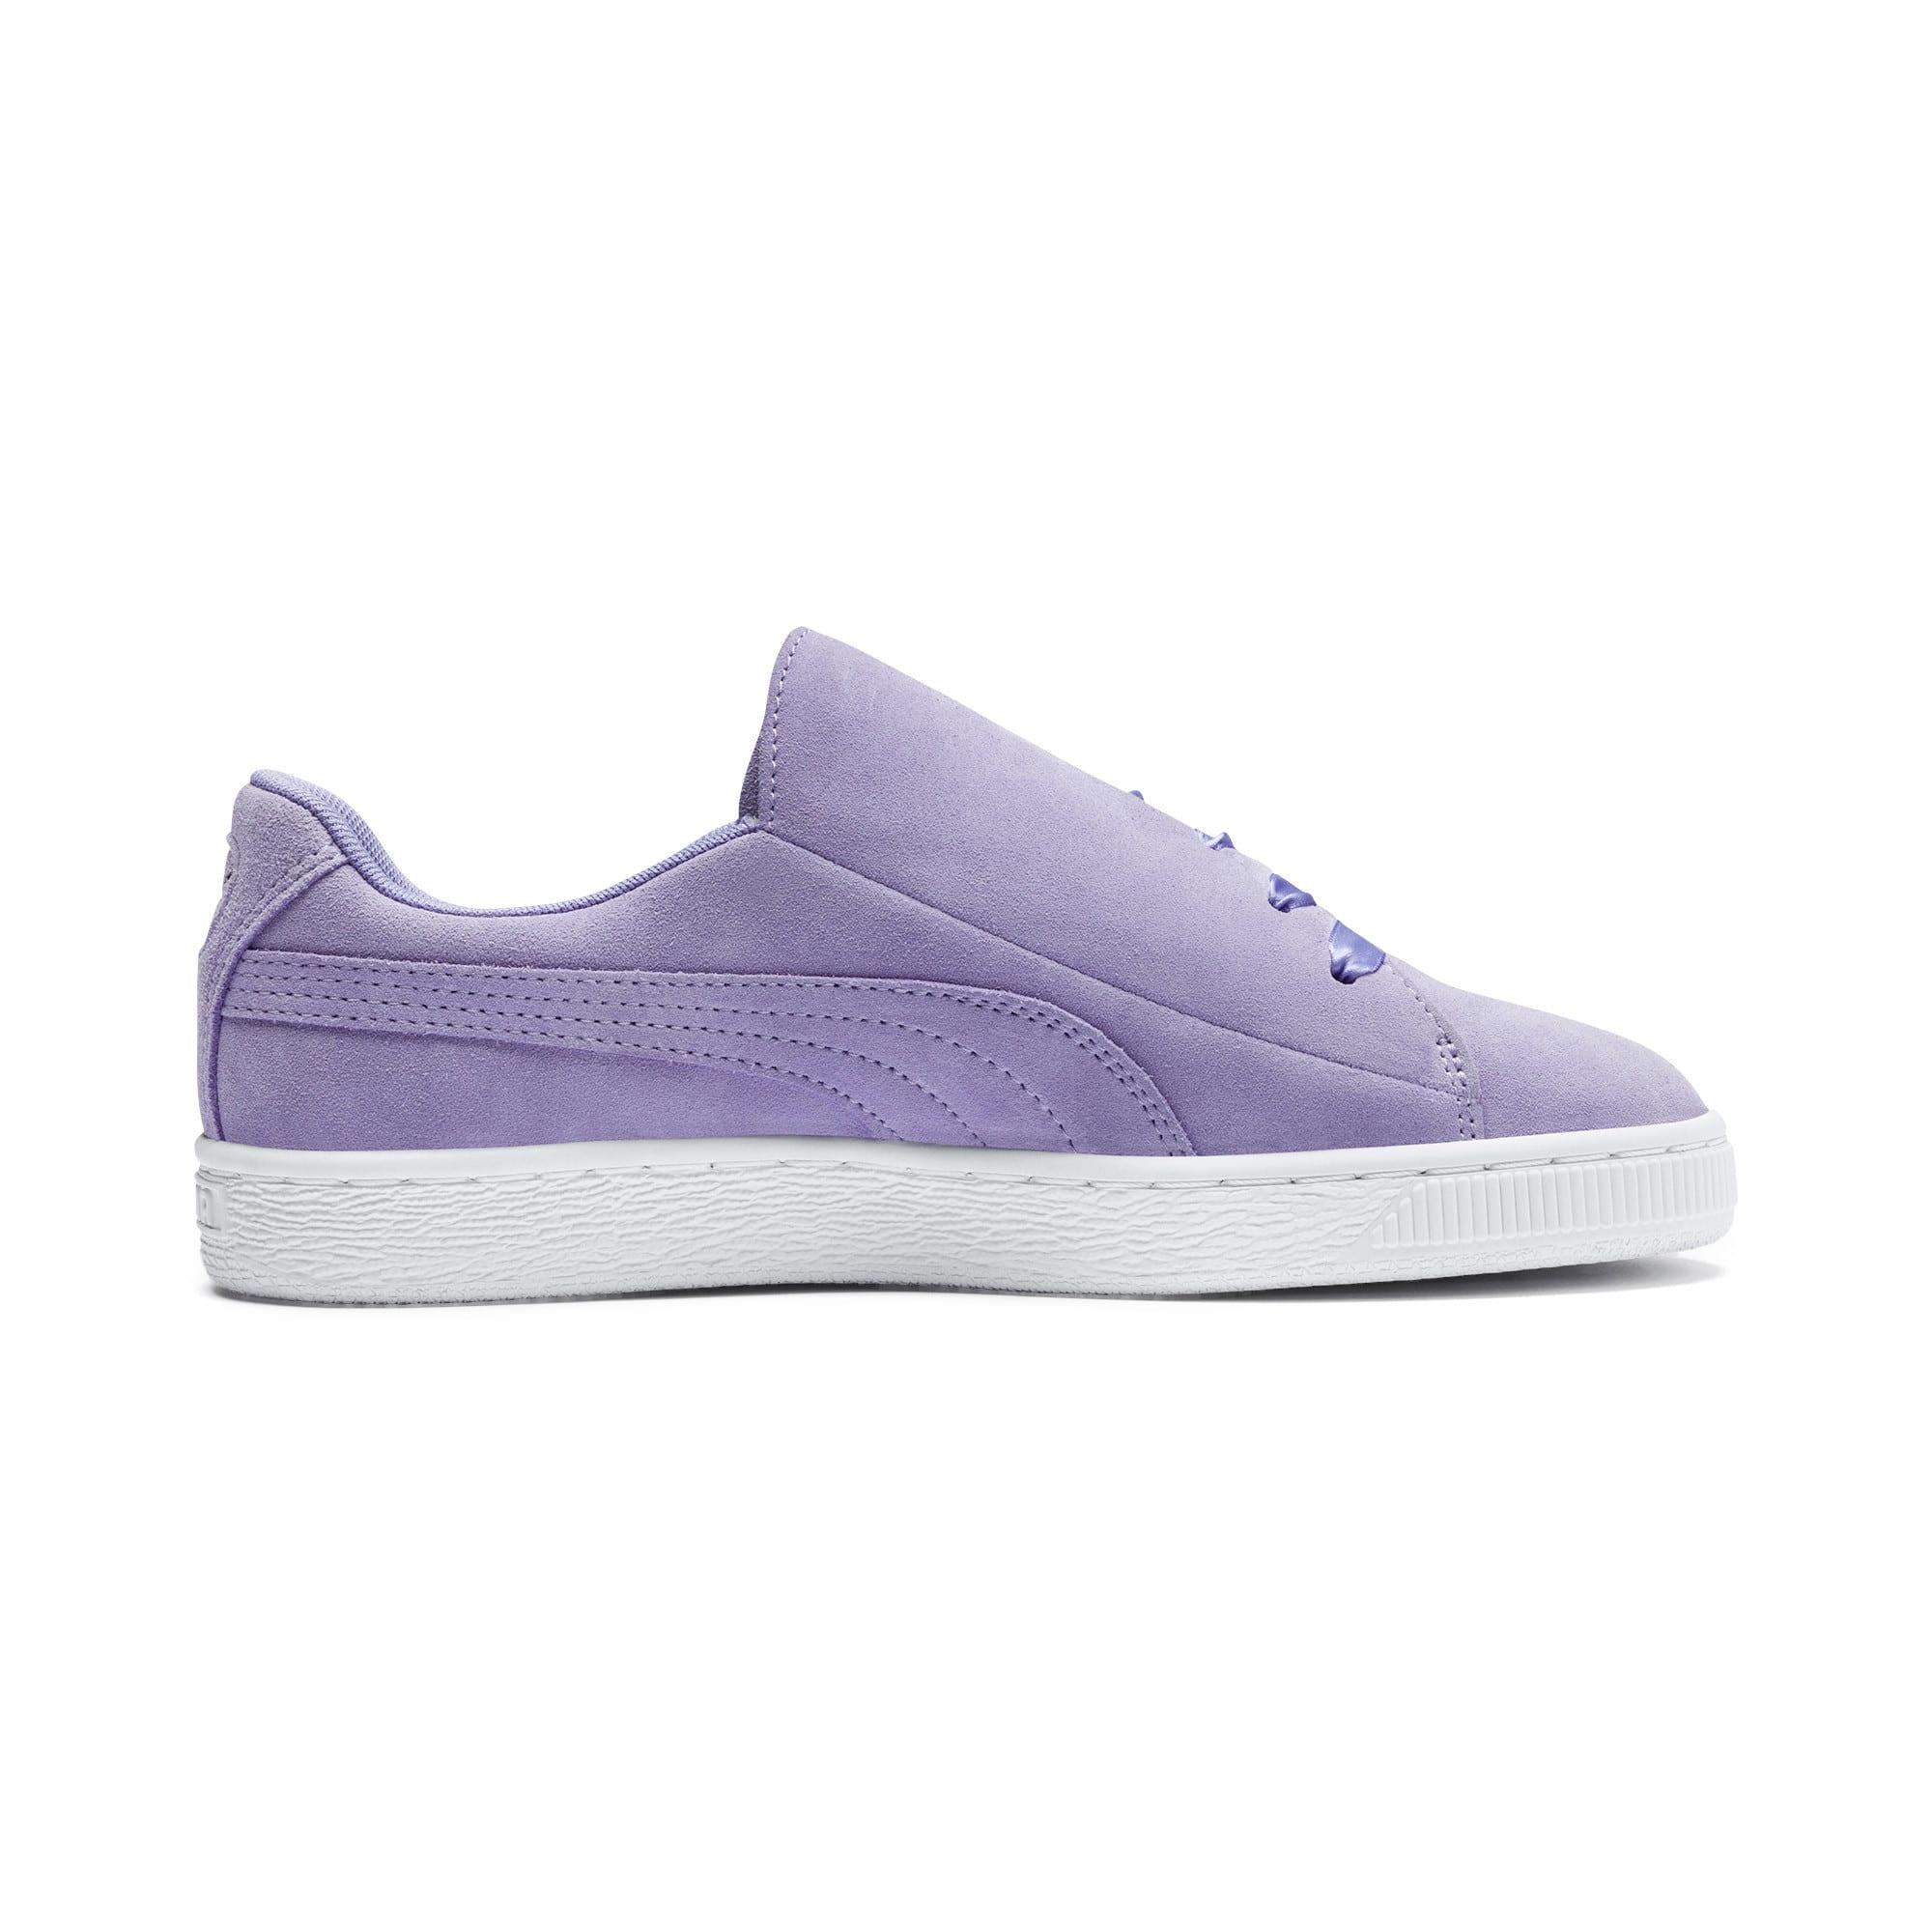 Thumbnail 5 of Suede Crush Women's Sneakers, Sweet Lavender, medium